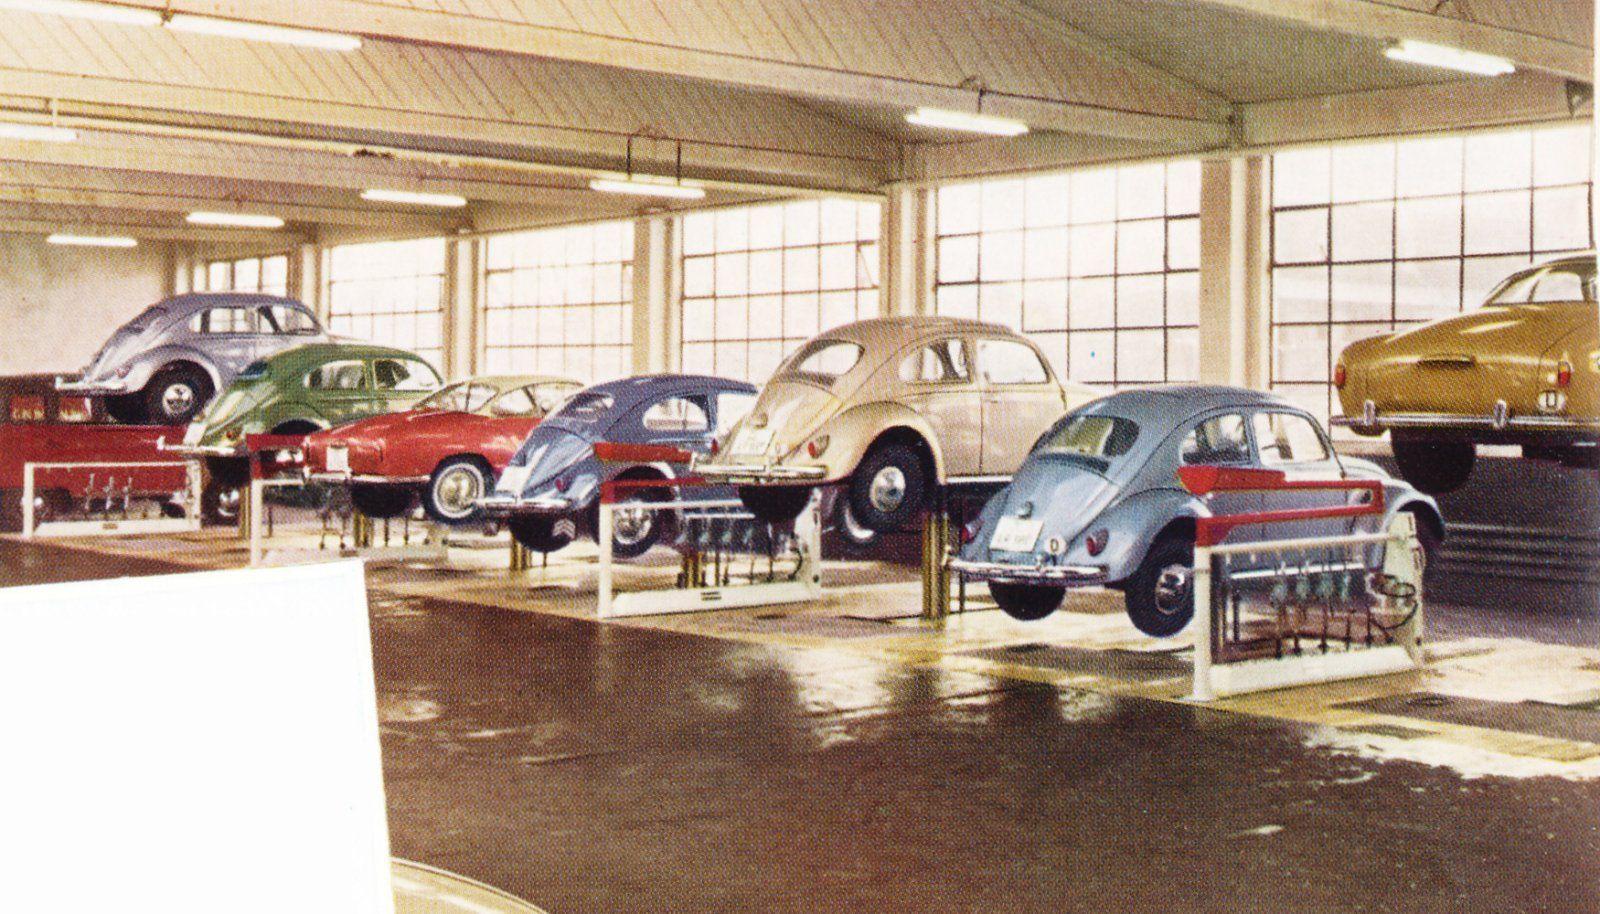 Auto Martens Dealership Oldenburg Germany Vintage Vw Vw Dealership Karmann Ghia